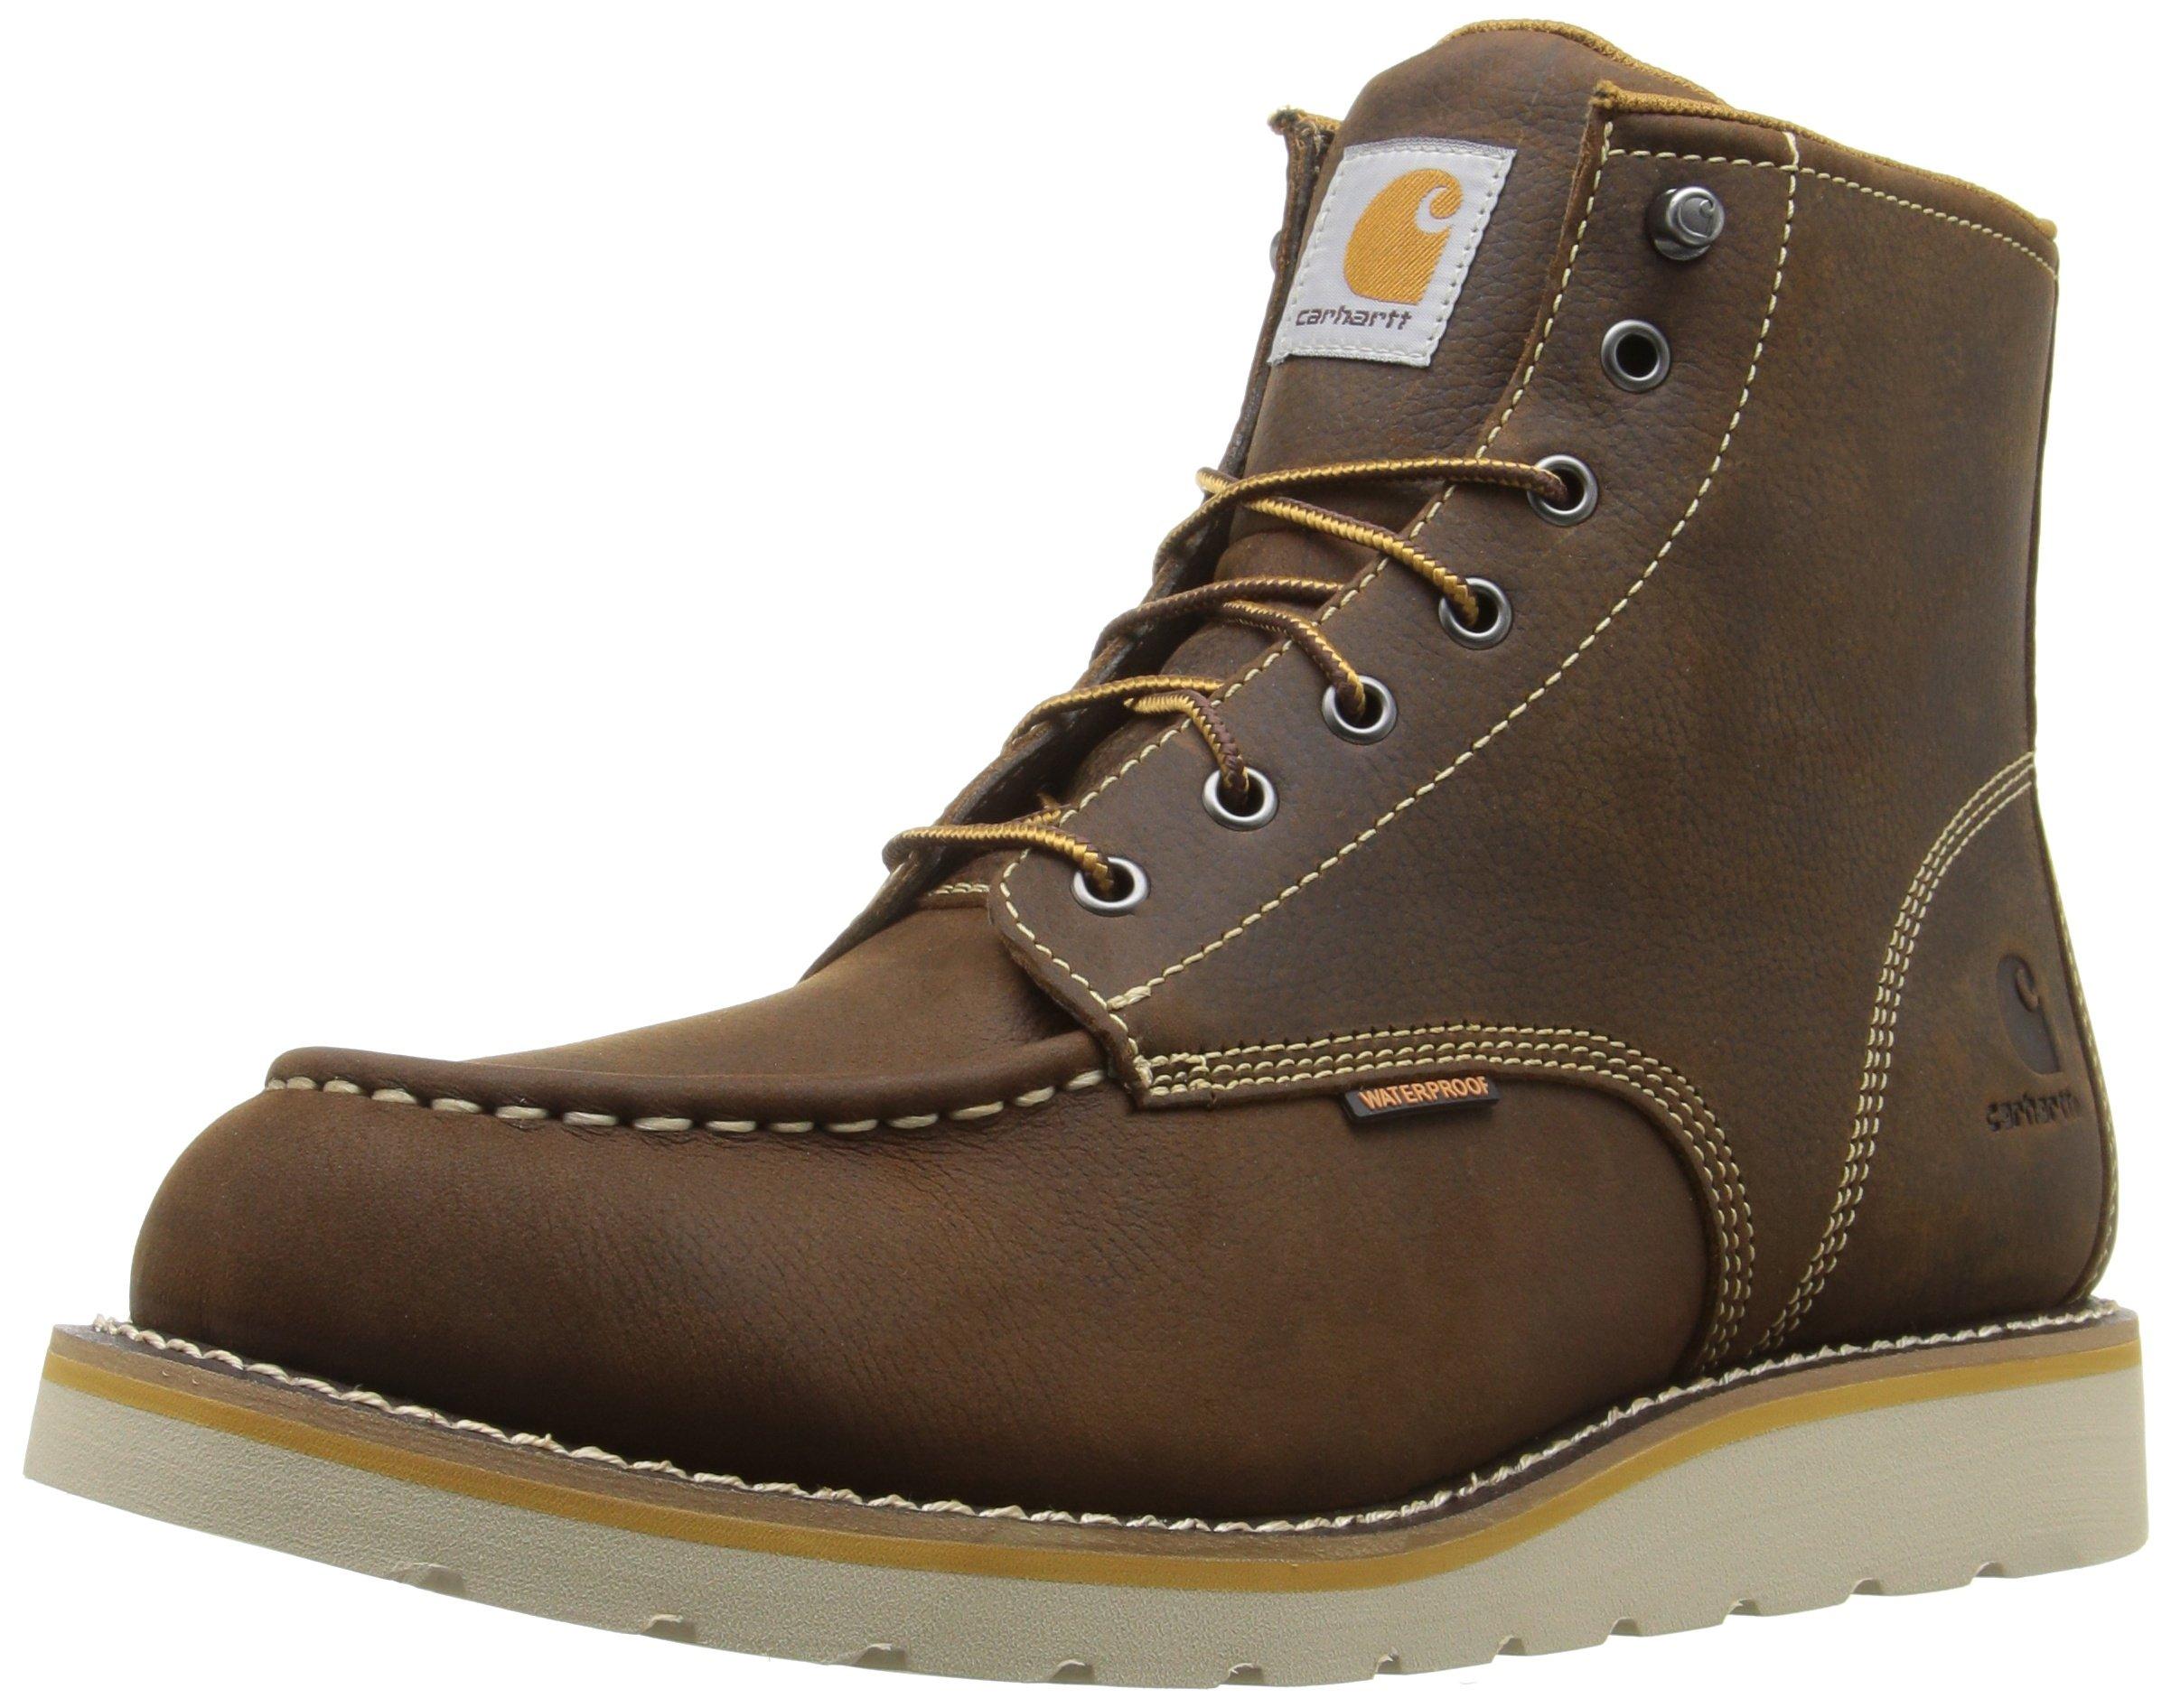 Carhartt Men's CMW6095 6'' Moc Toe Casual Wedge Work Boot, Brown, 10 M US by Carhartt